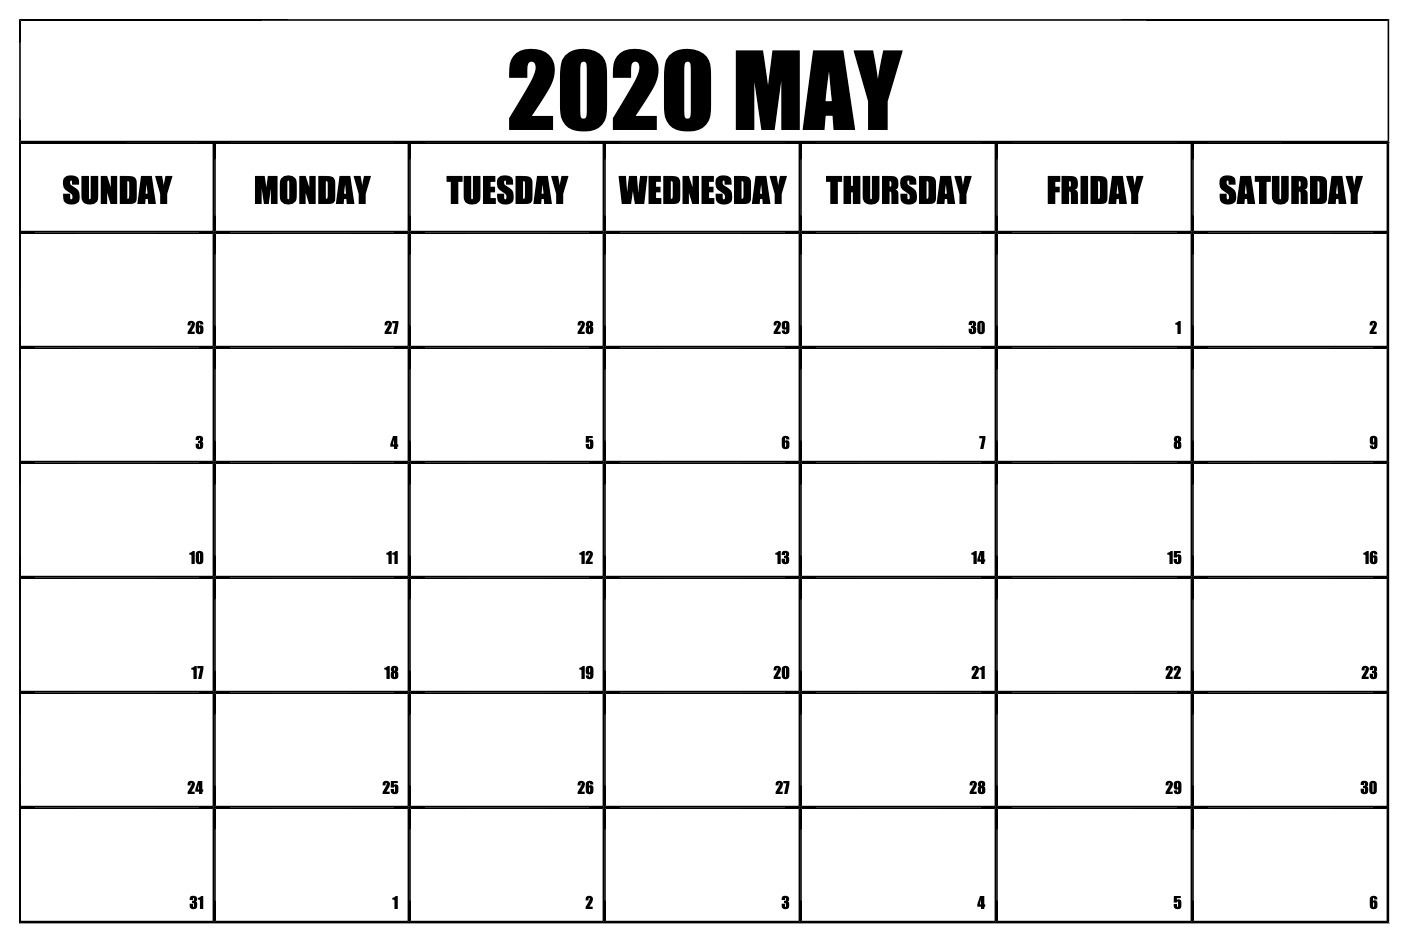 Free May 2020 Calendar – Blank Printable Template